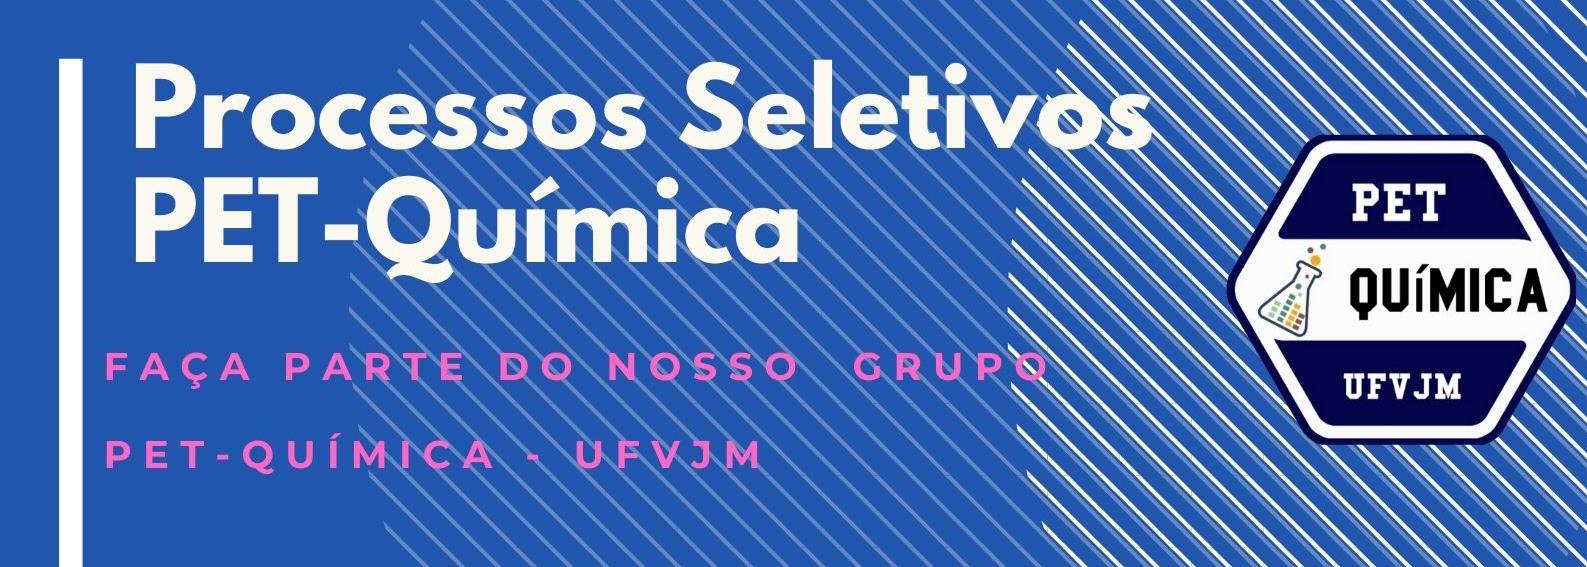 banner-processos-seletivos2021